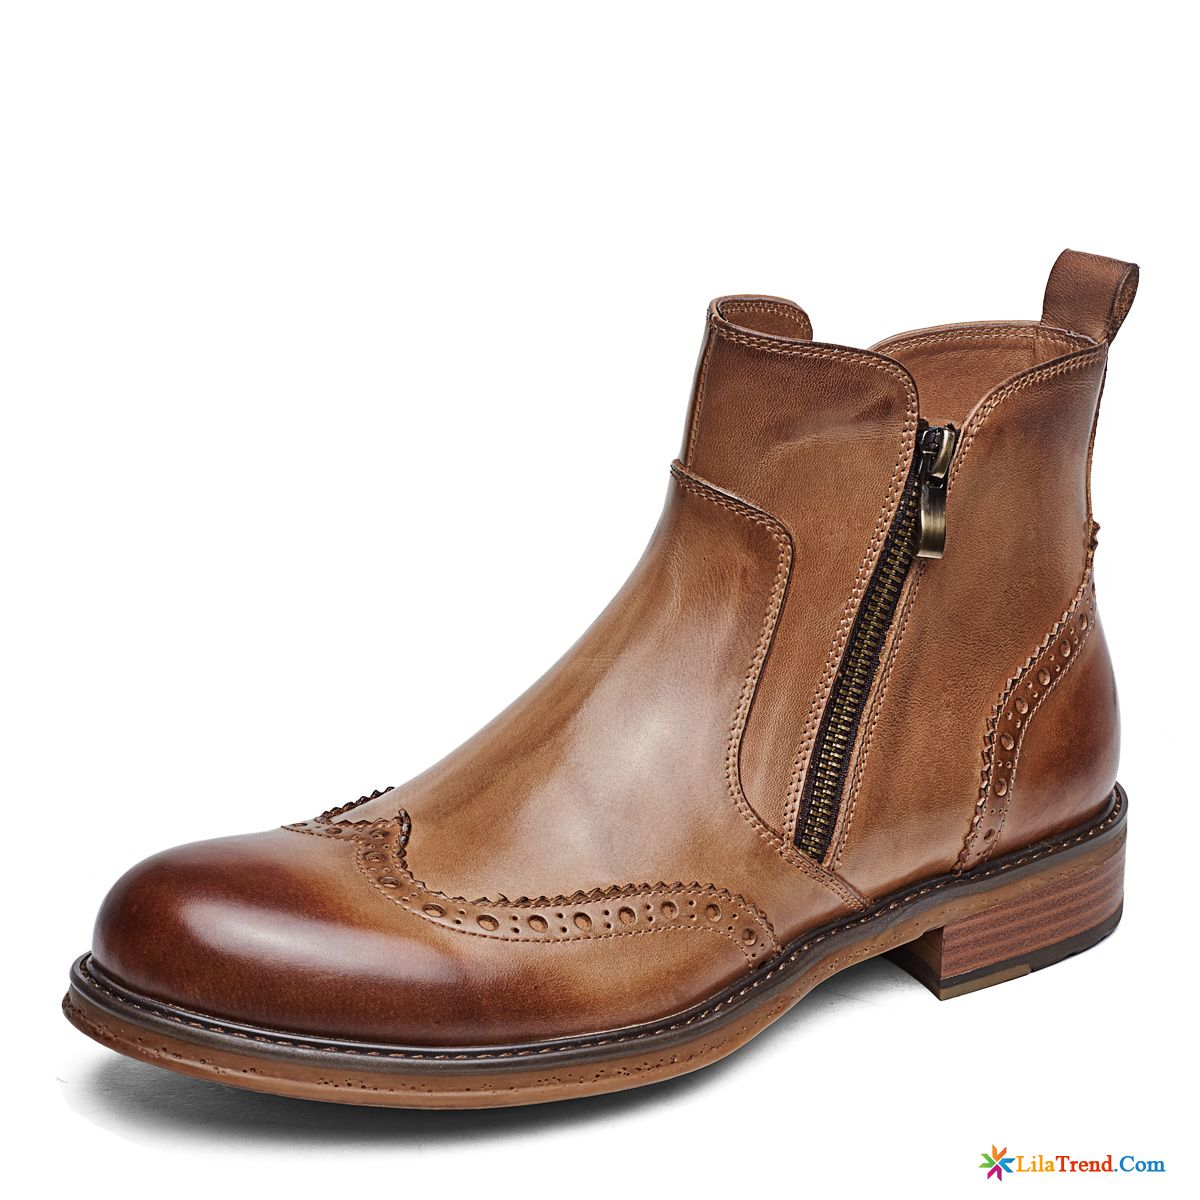 84a07e912b66ab Graue Wildlederschuhe Herren Lavendel Schuhe Retro British Hohe Martin  Stiehlt Rabatt